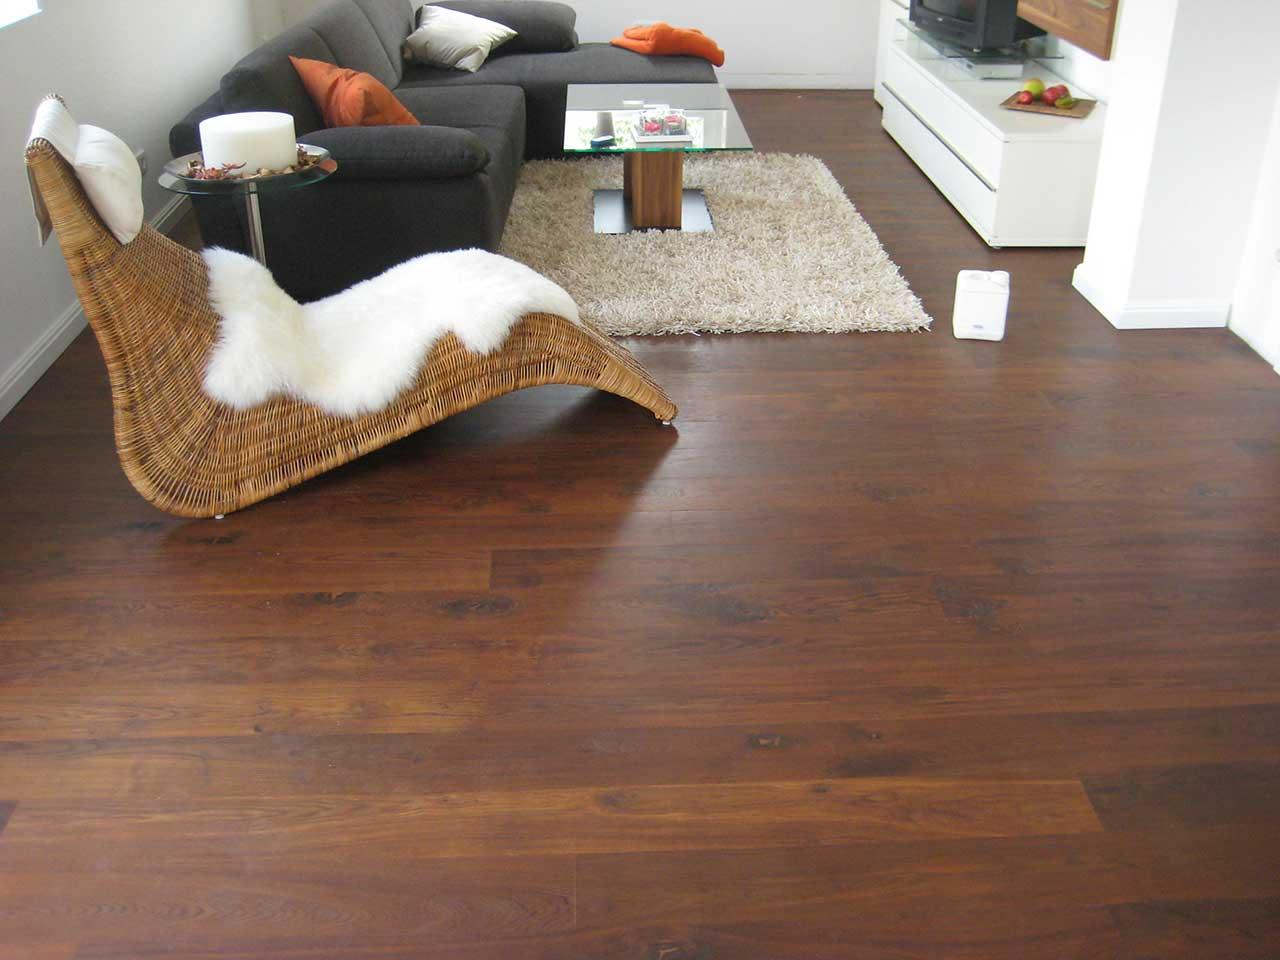 dielenboden ged mpft rozyn parkettb den. Black Bedroom Furniture Sets. Home Design Ideas